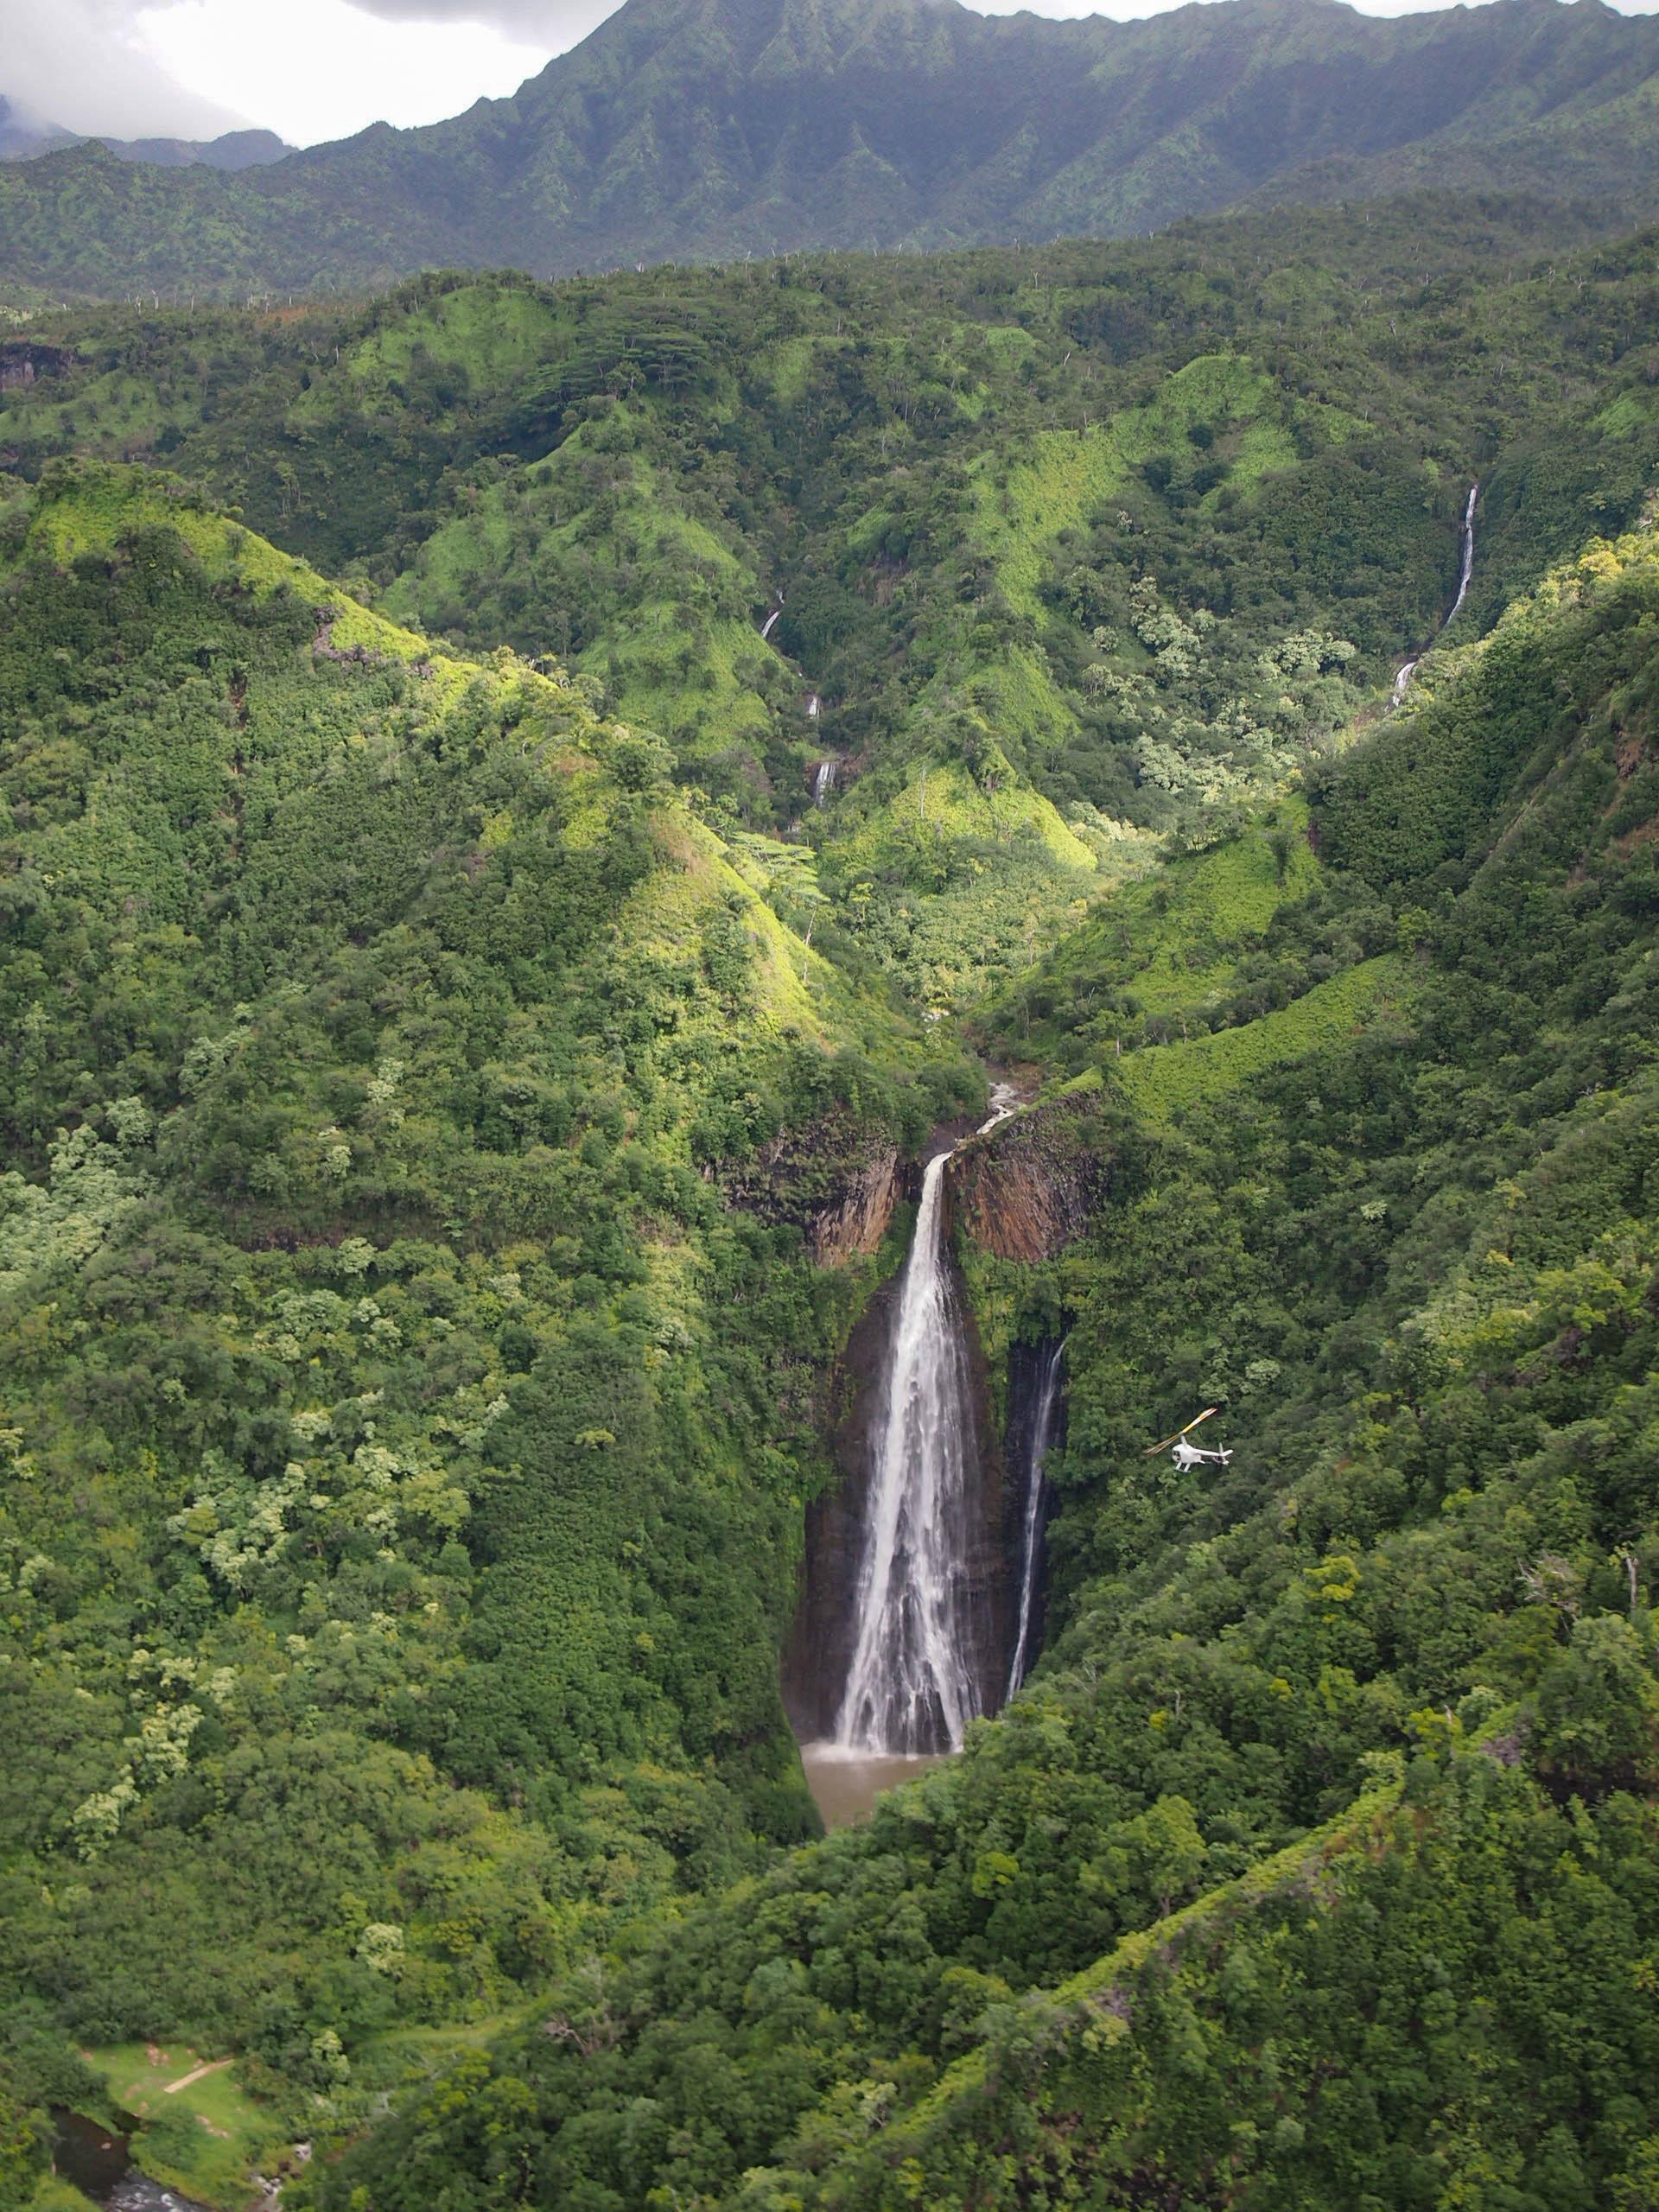 Waterfall from Jurassic Park in Kauai